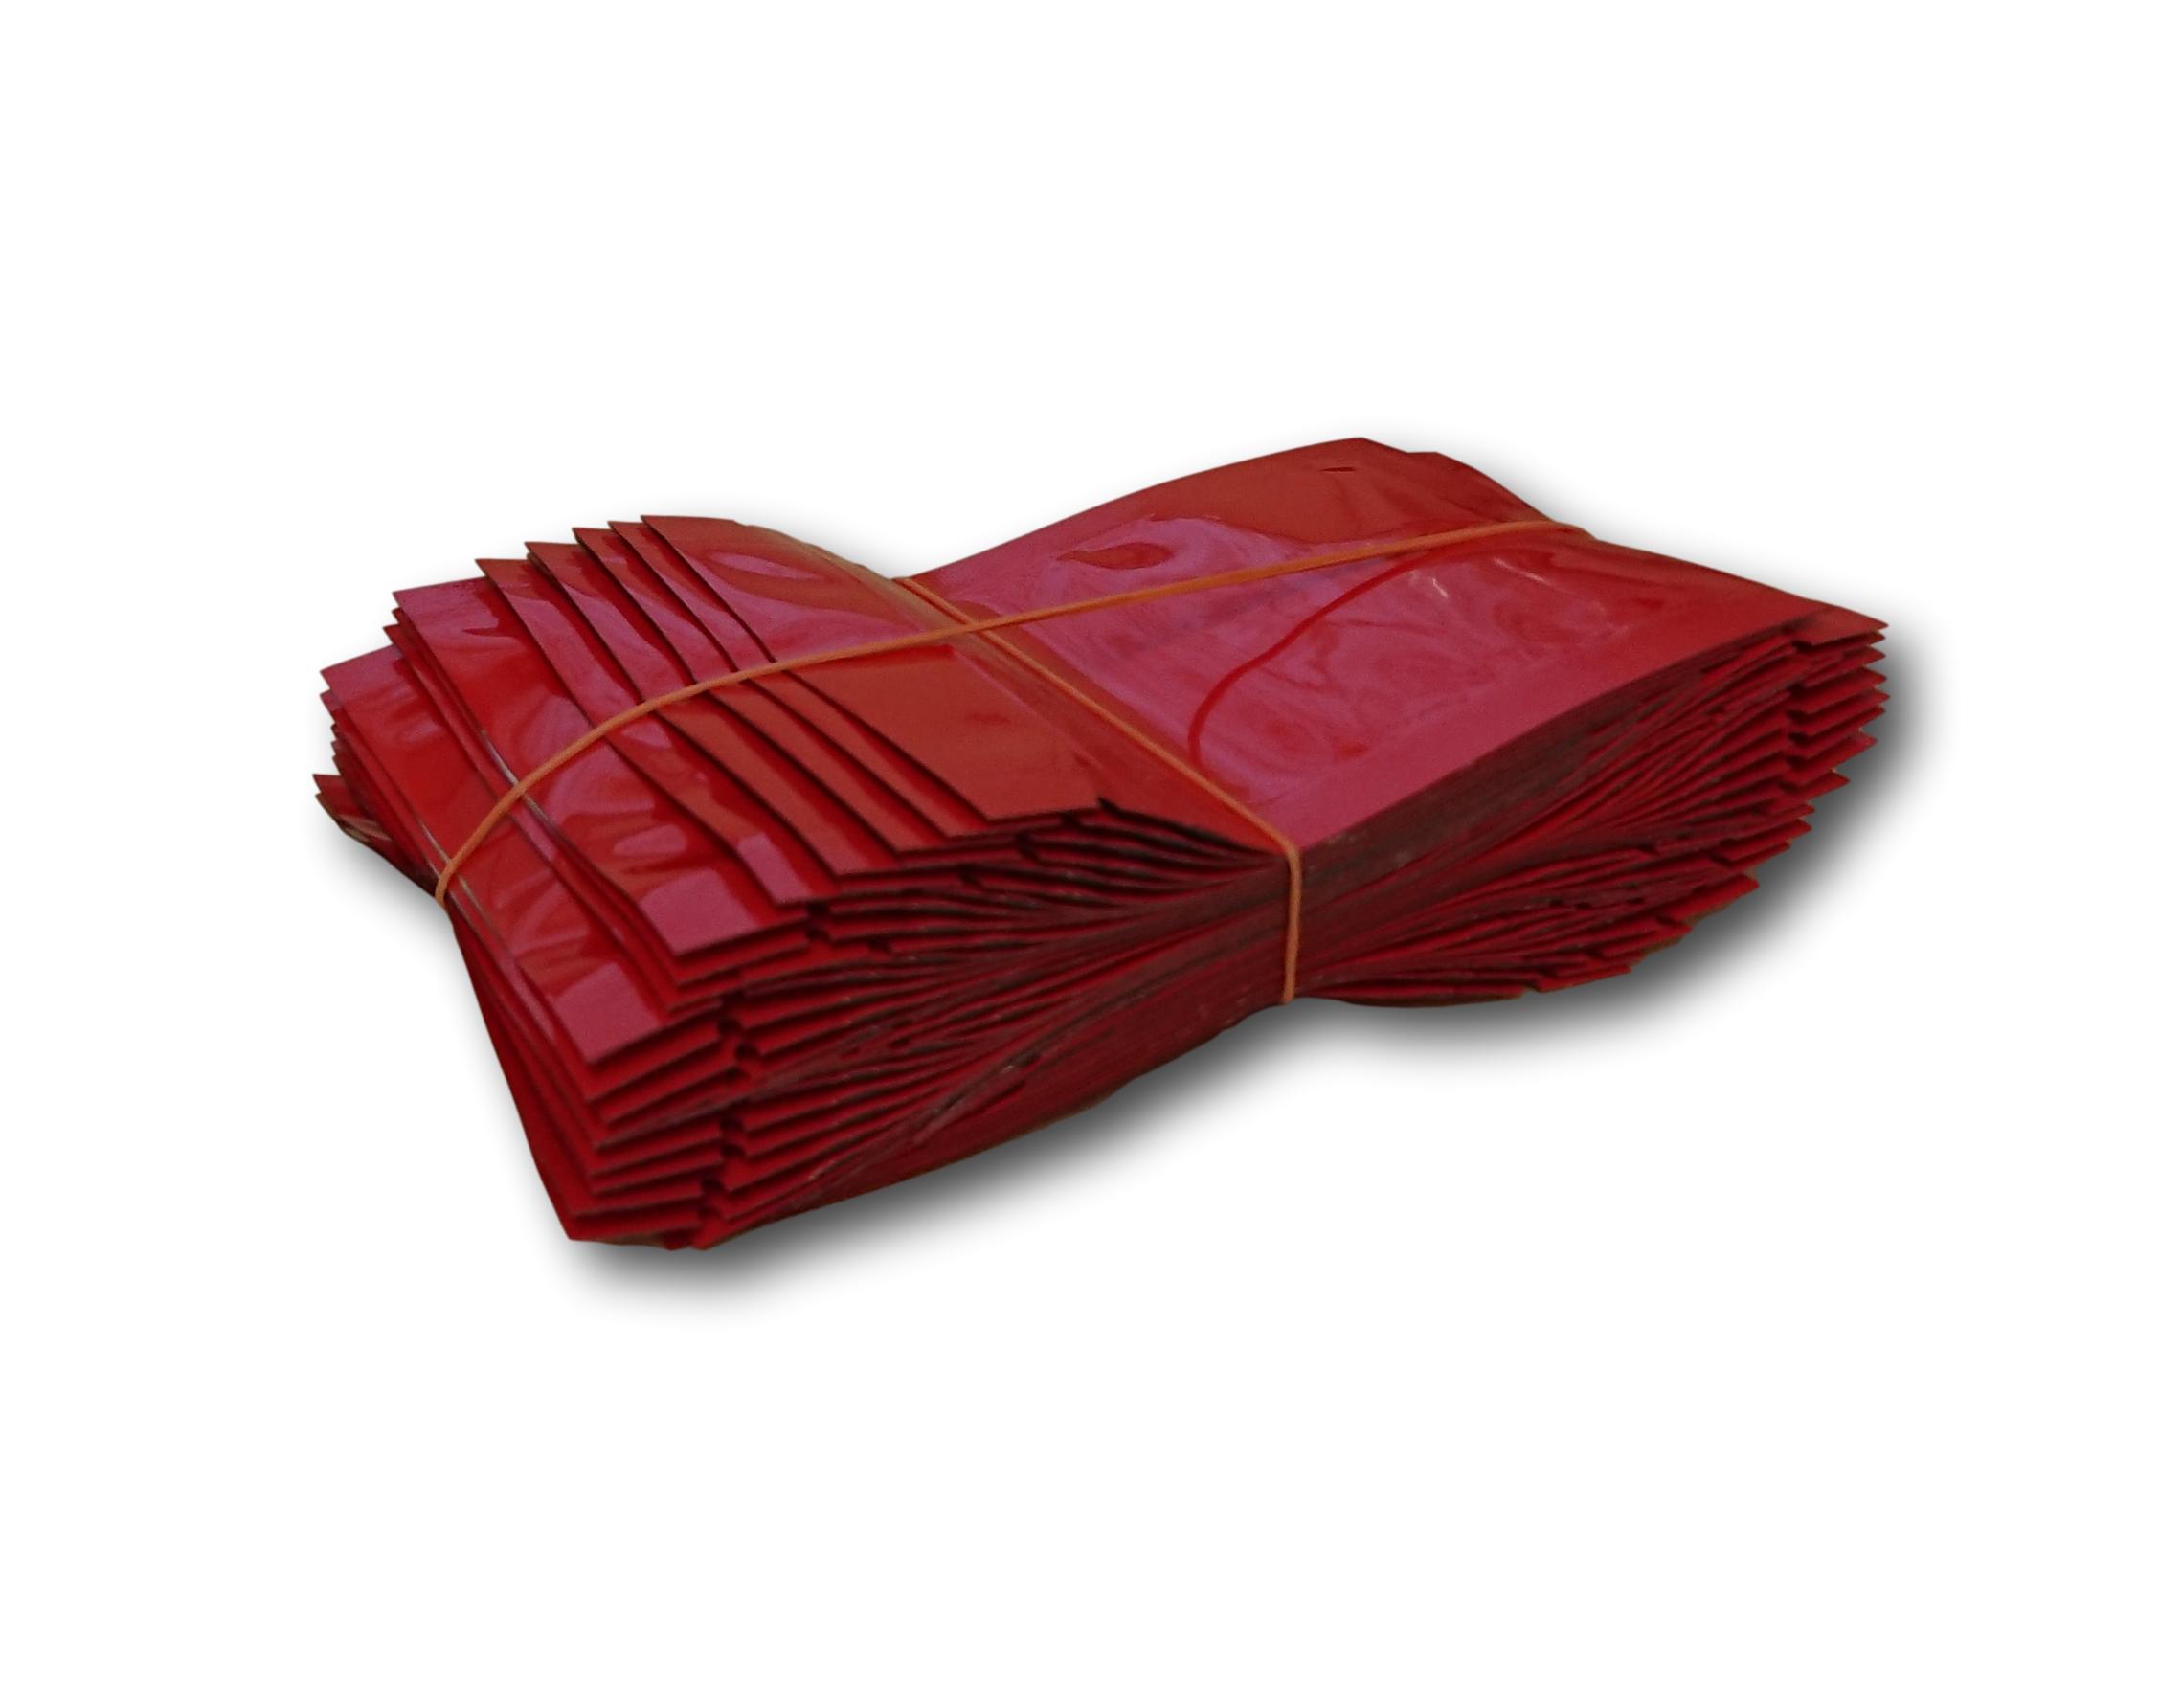 Mylar Pouch - 7.5cm x 10cm - Red